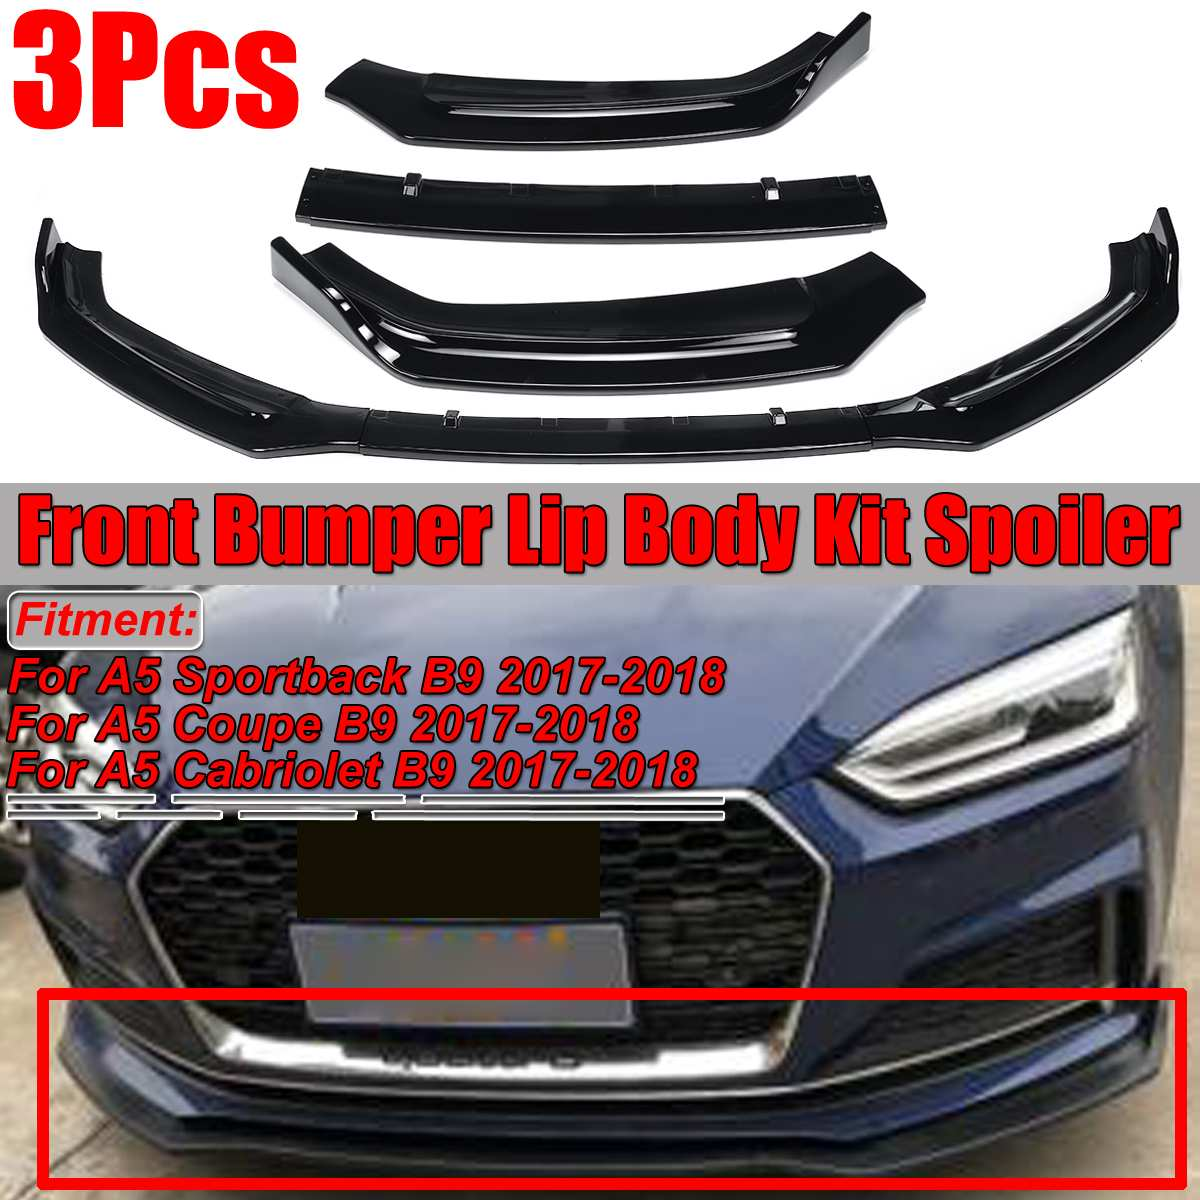 For Audi A3//A4 Sedan 2017 2018 Gloss Black ABS Front Bumper Lip Cover Trim 3Pcs